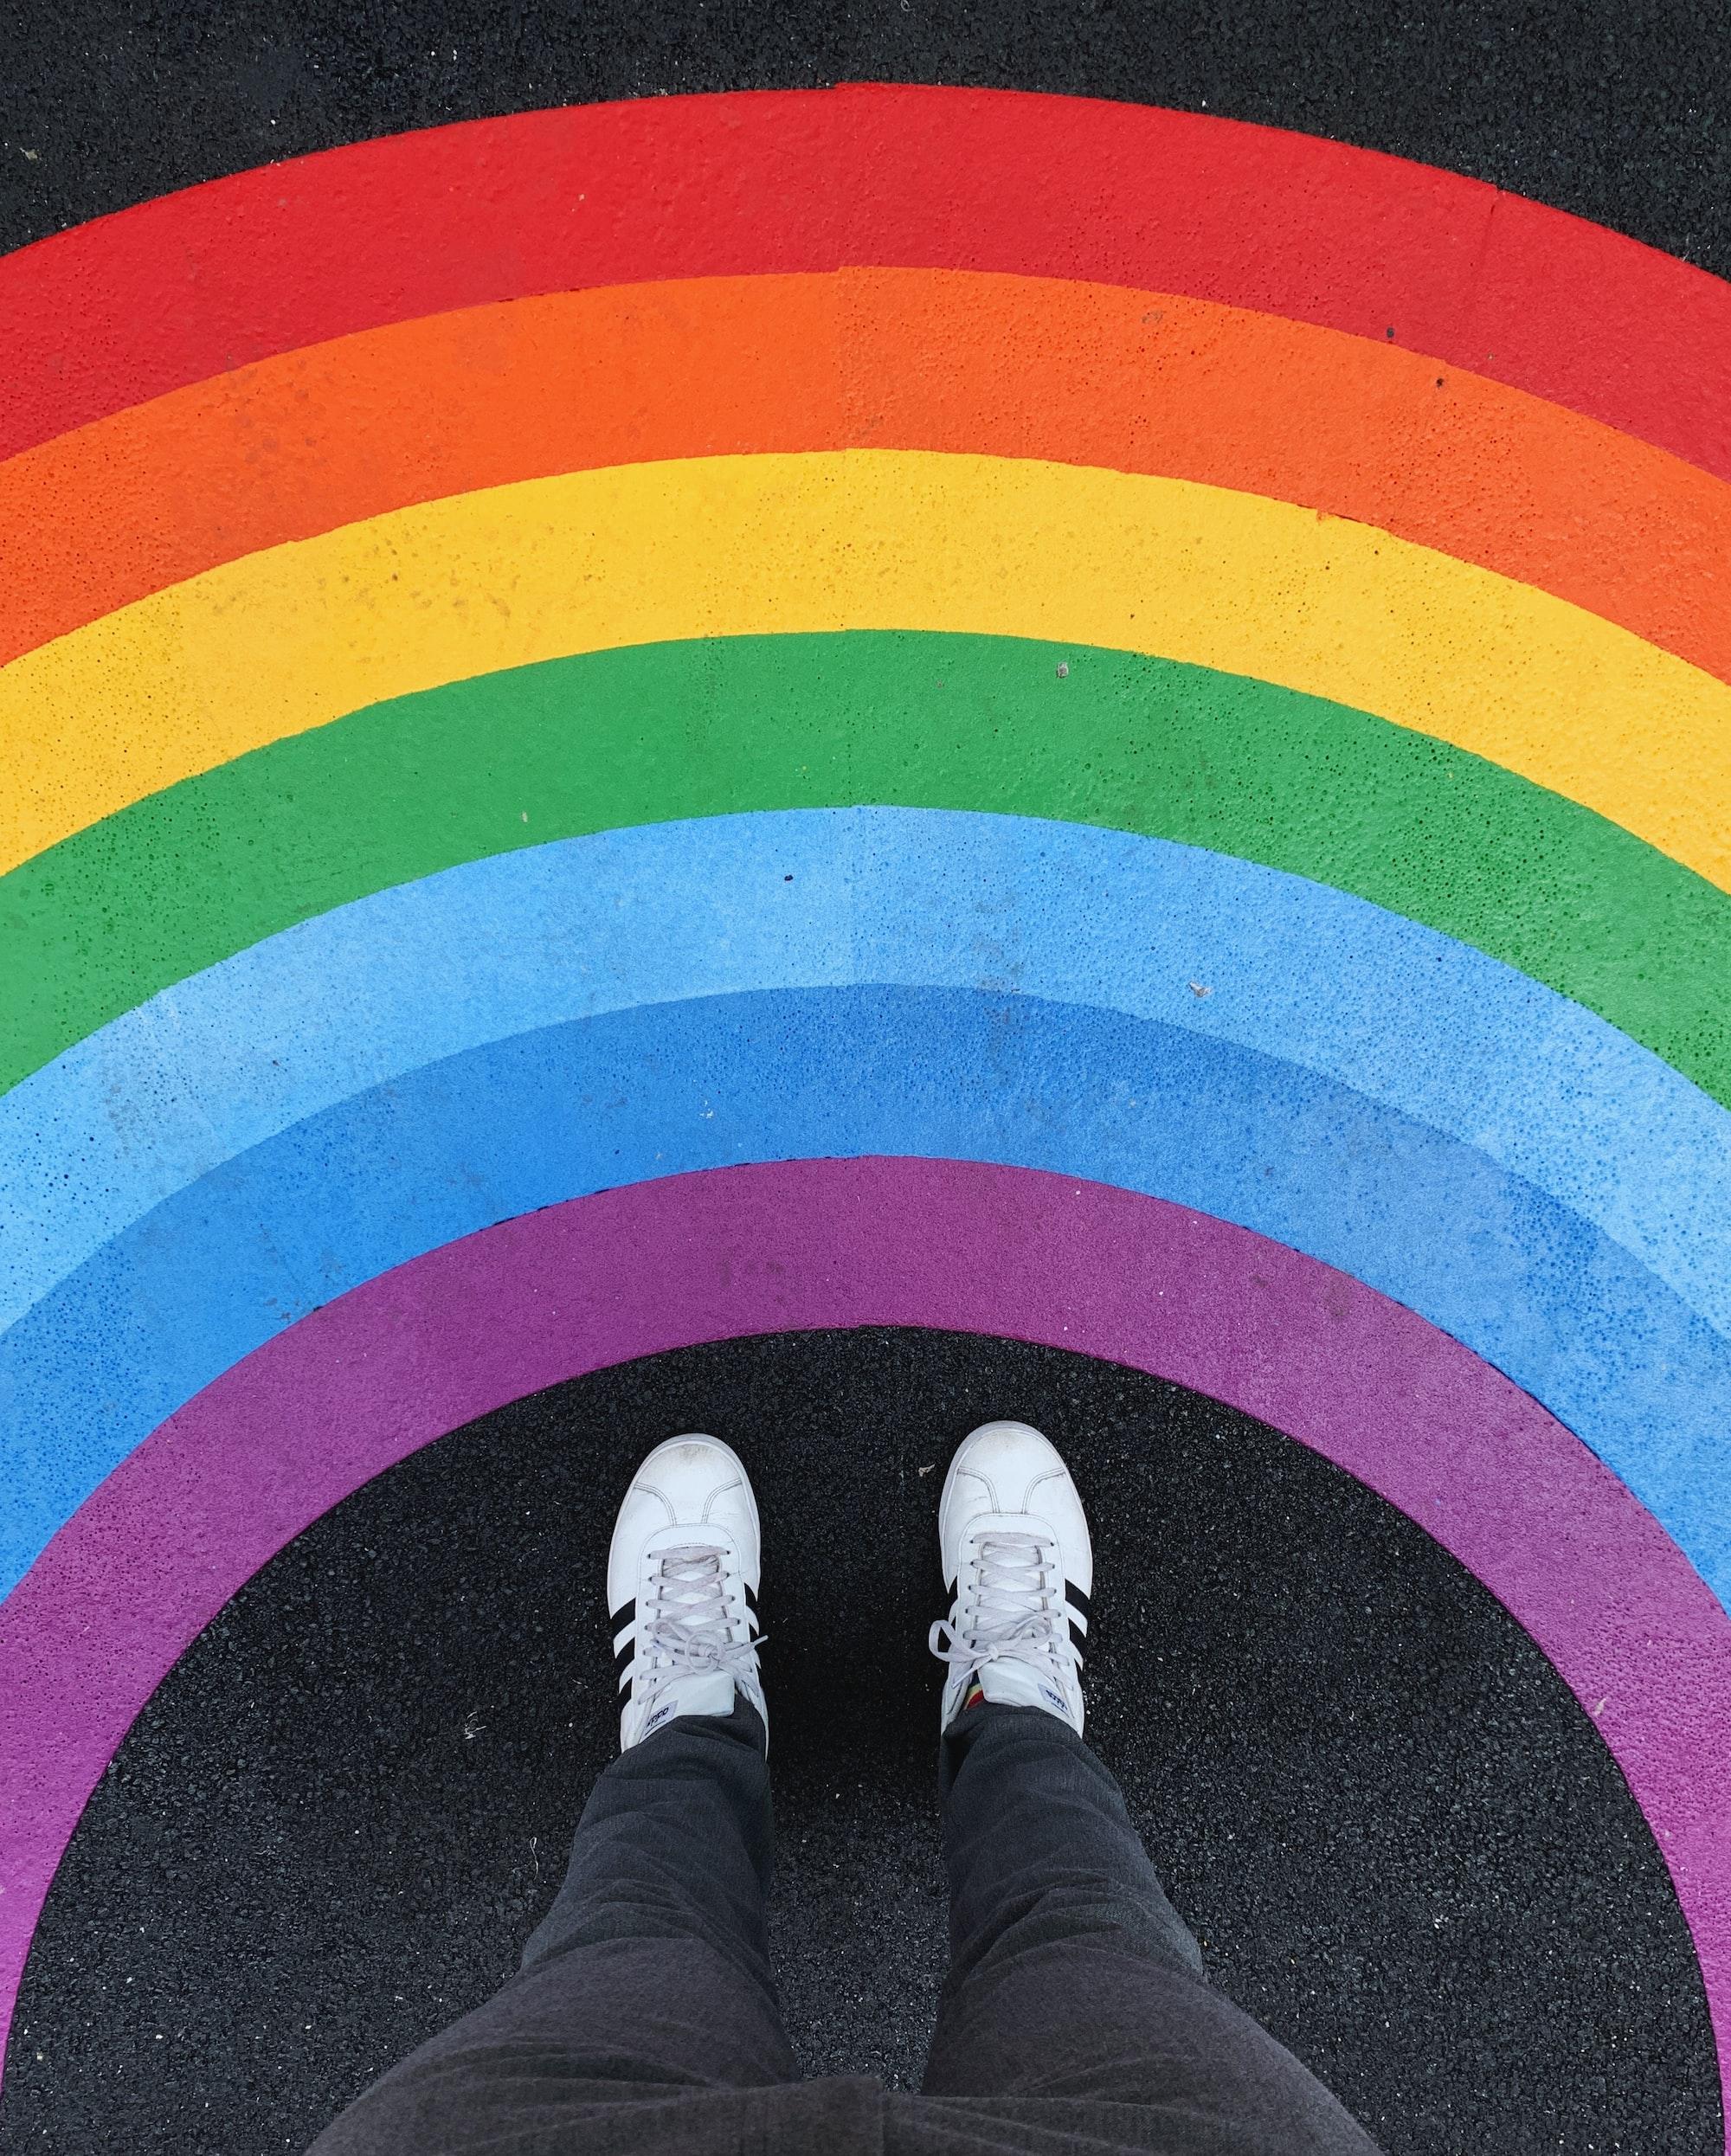 Pledges to gender identity ideology